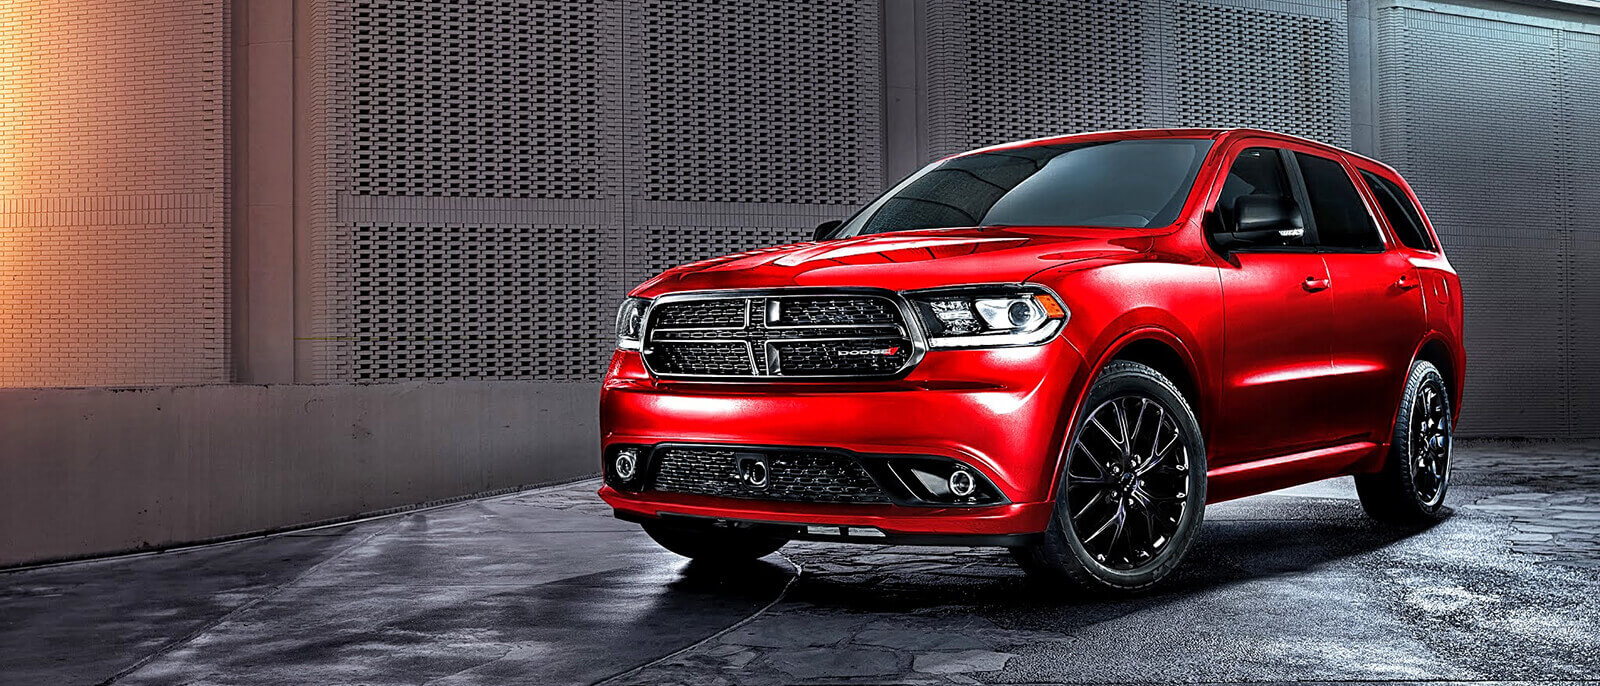 2017 Dodge Durango Red